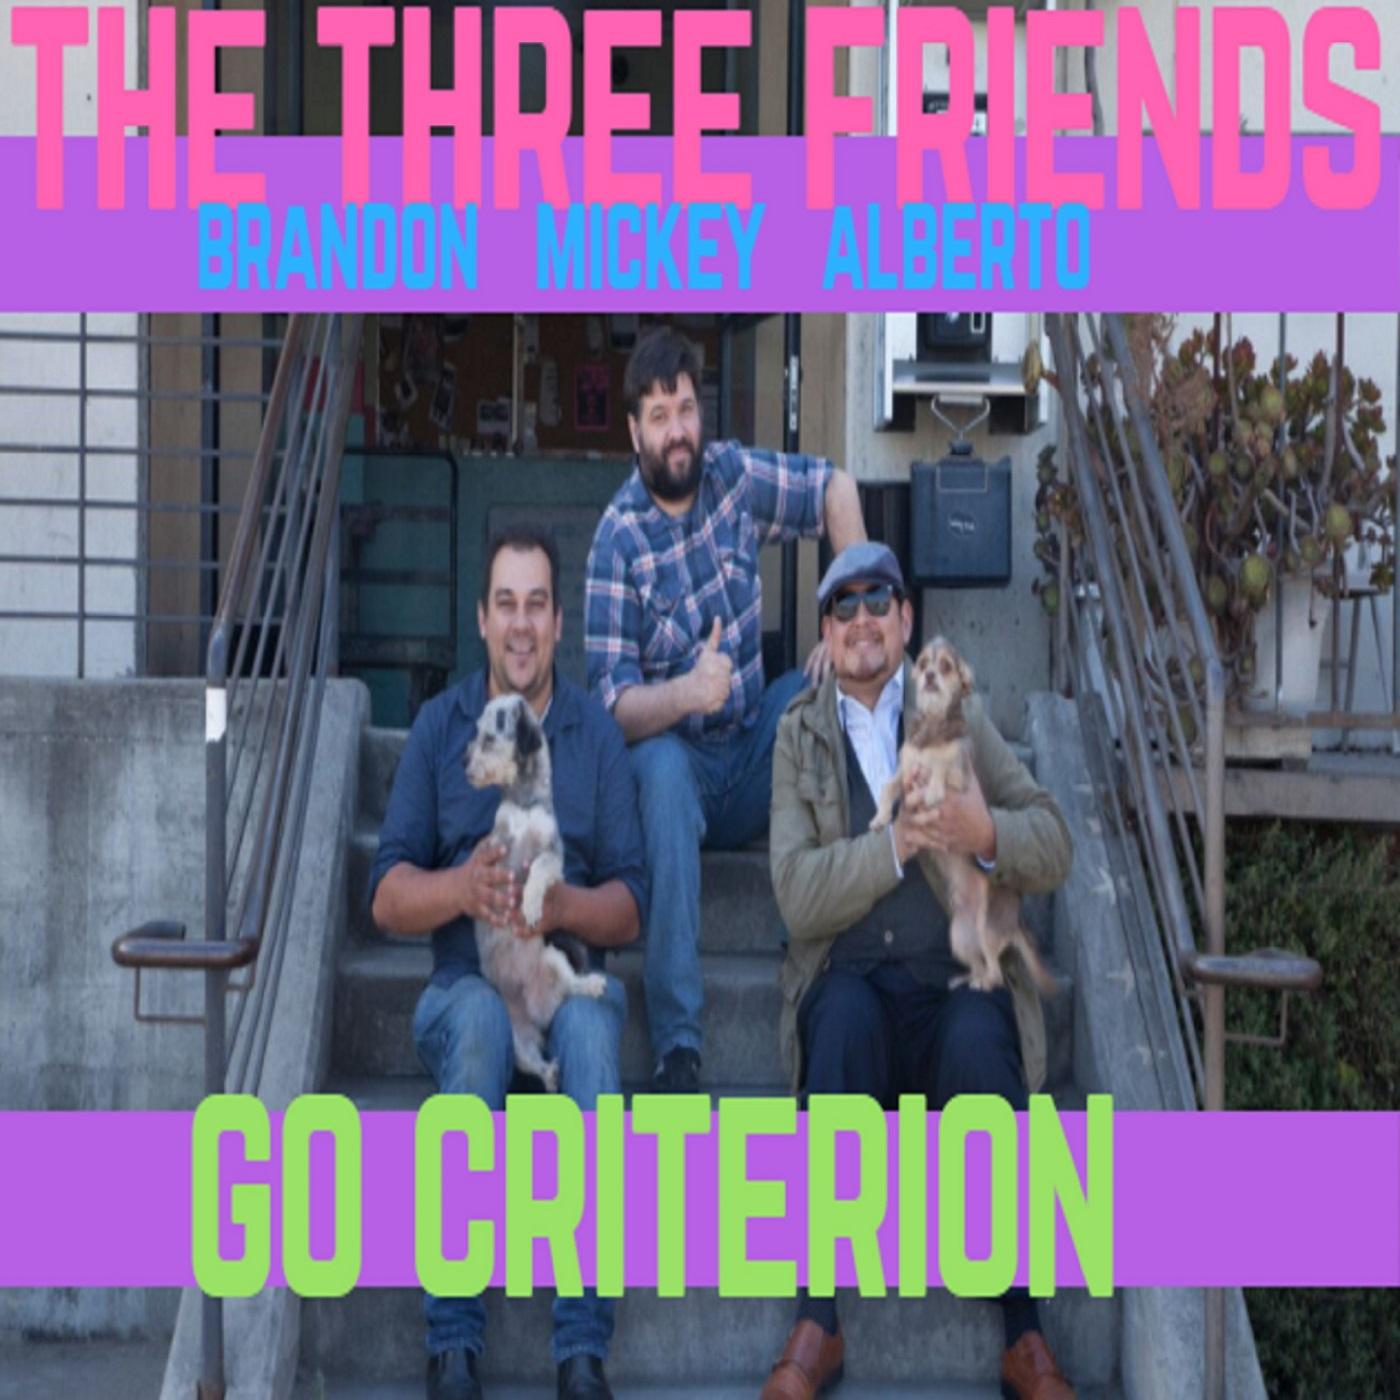 the Three Friends go Criterion show art